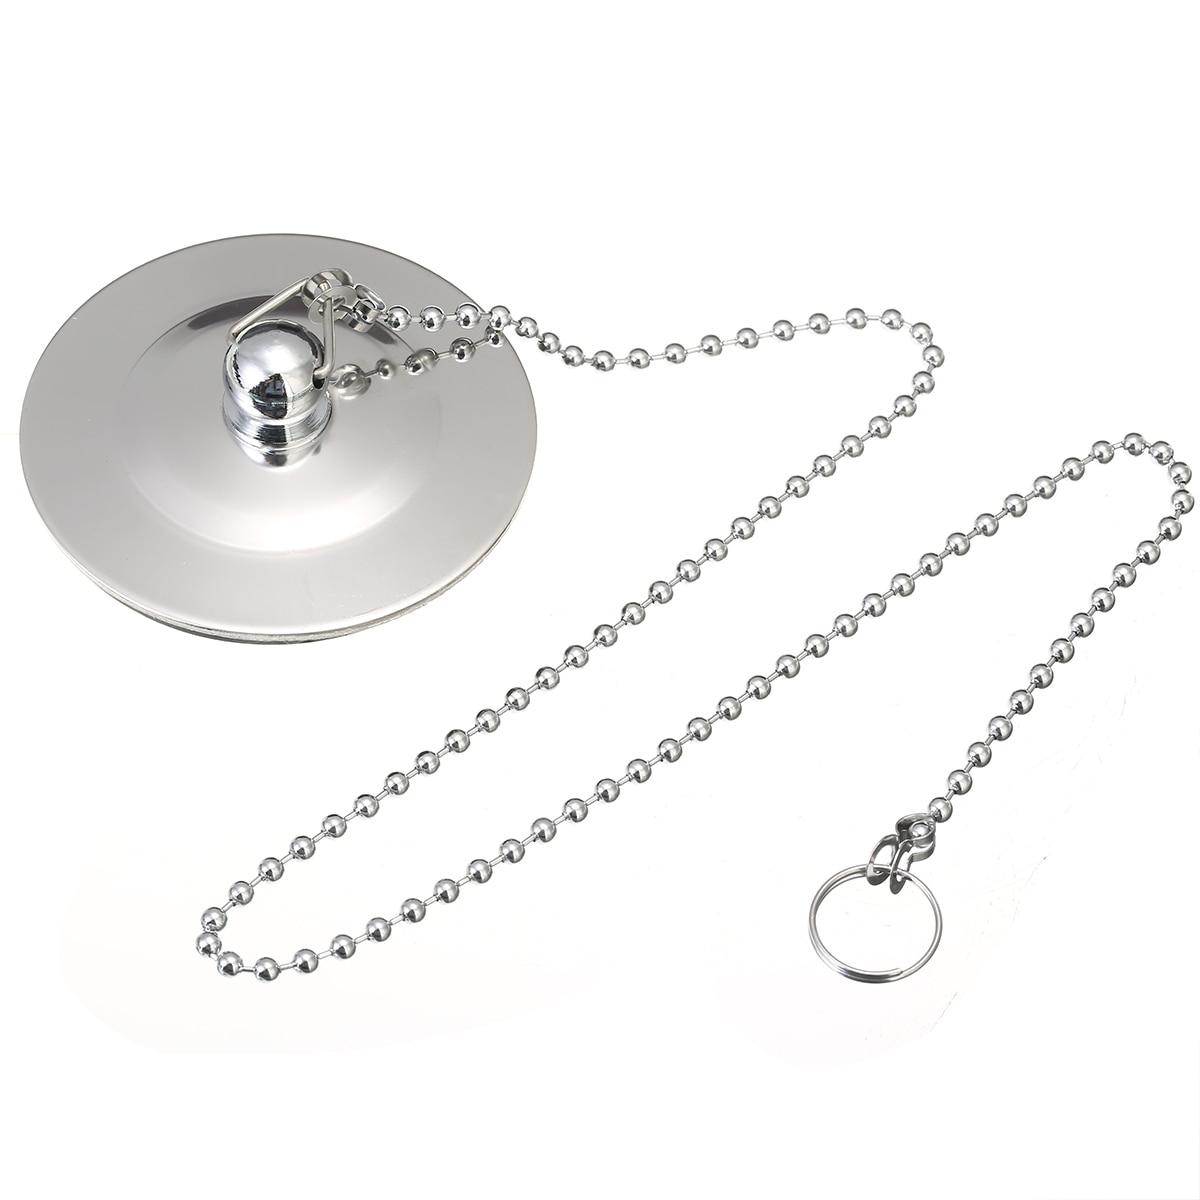 1pcs Chrome Plated Bath Tub Drainer Silver Bathtub Stopper Metal Waste Plug With Chain Bathtub Accessories Mayitr